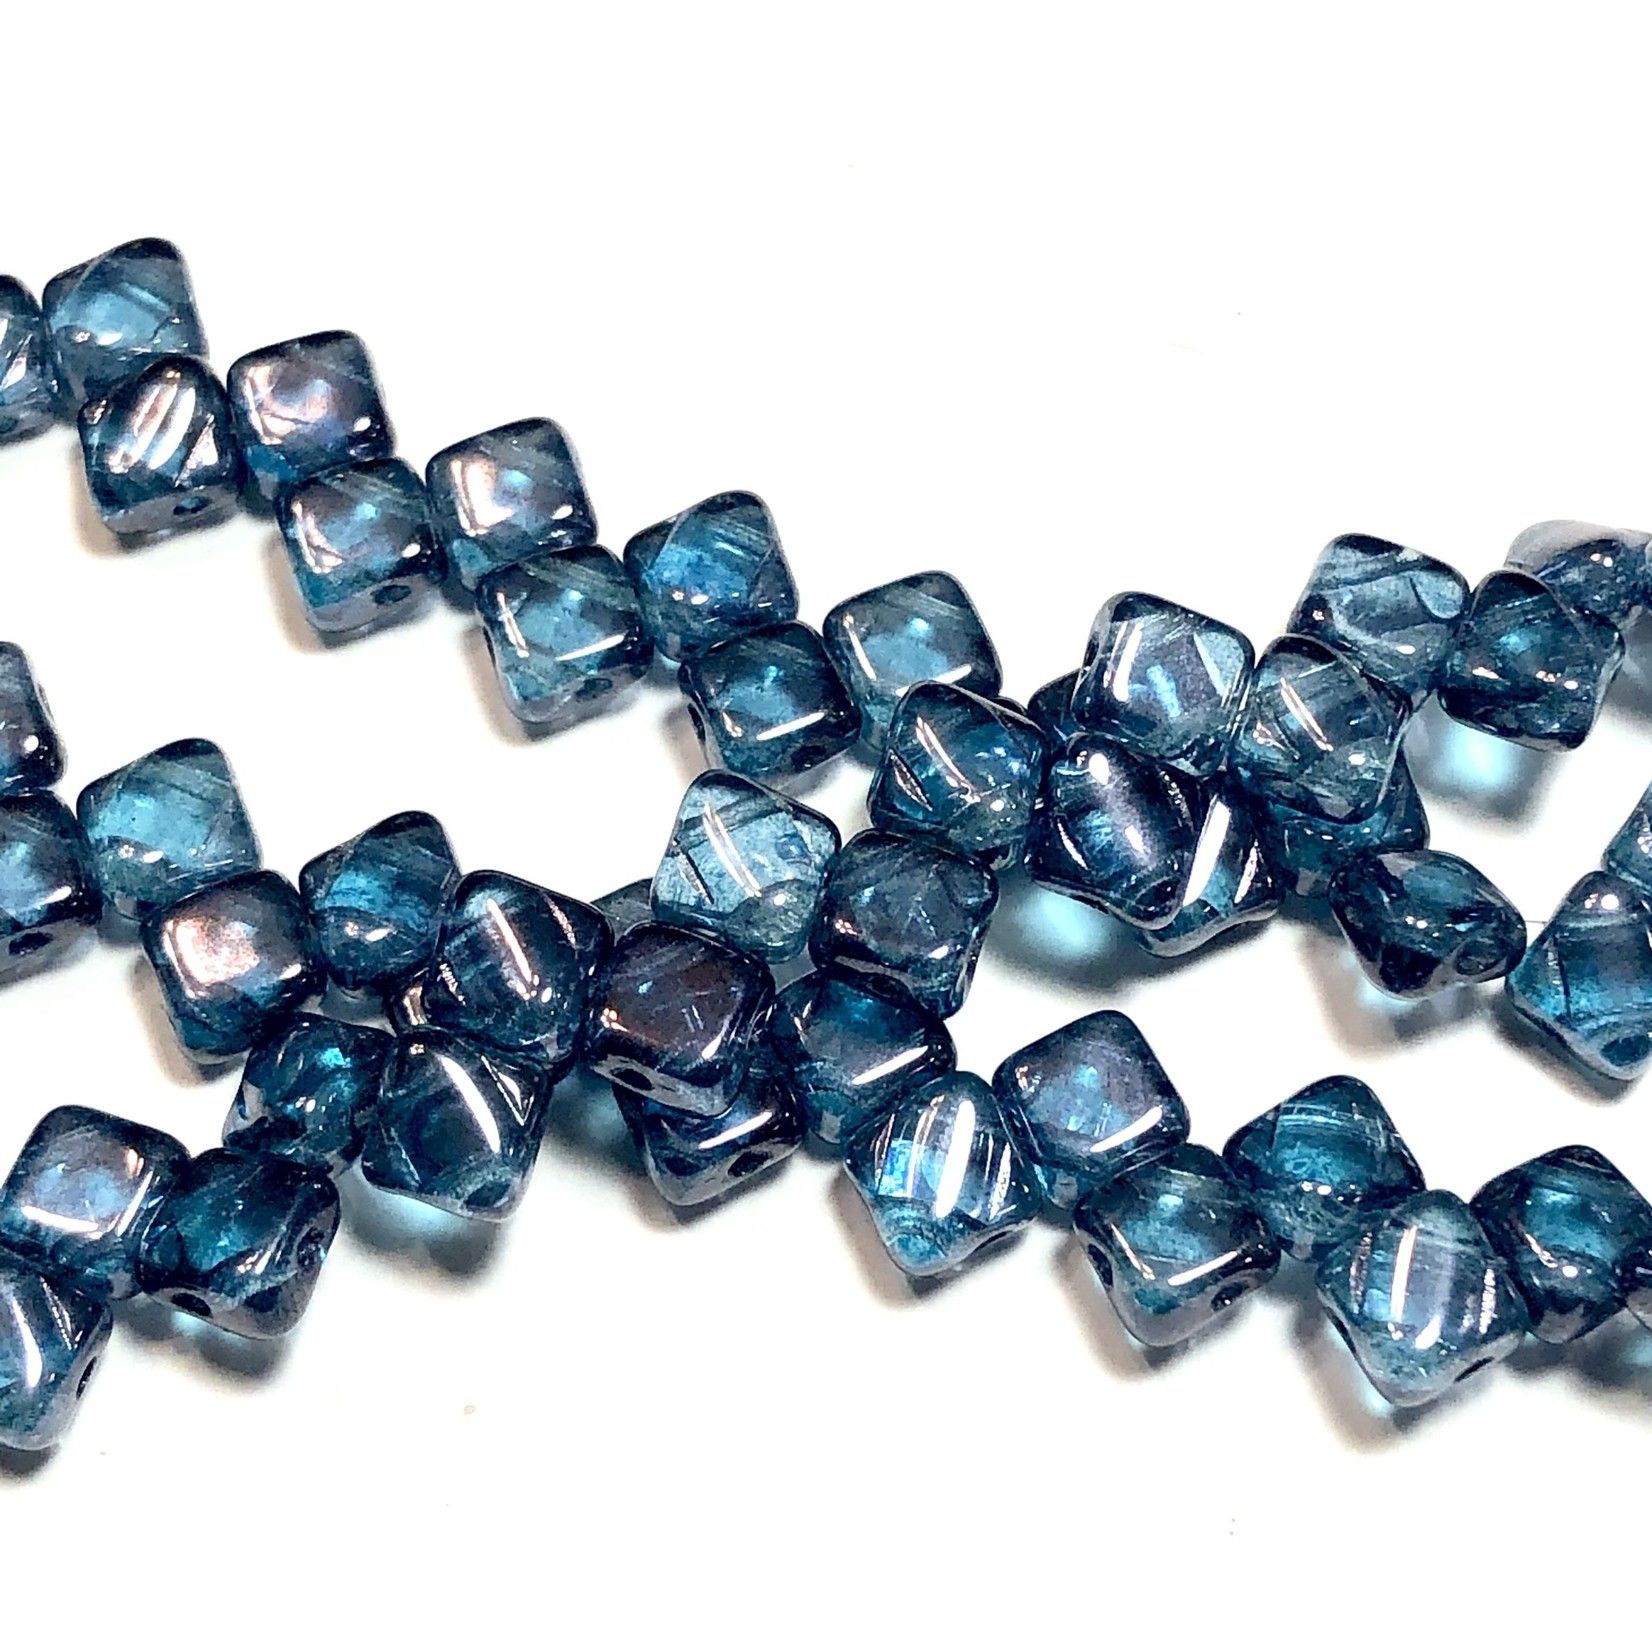 2-Hole SILKY Bead Alex Blue Luster 40pcs 6.5mm